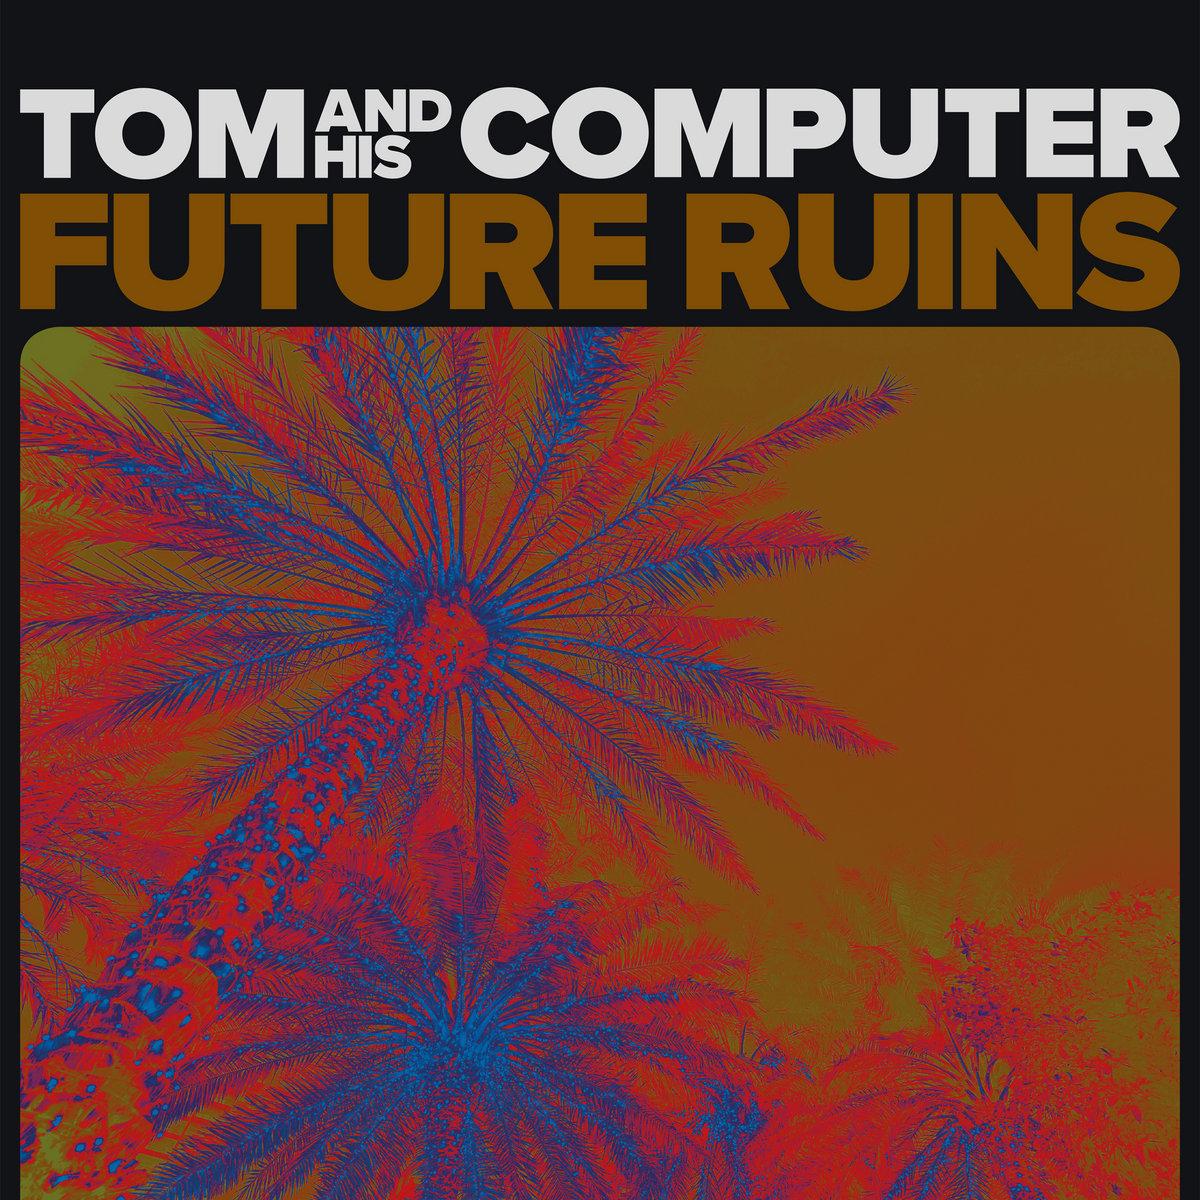 TOM and HIS COMPUTER - Future Ruins